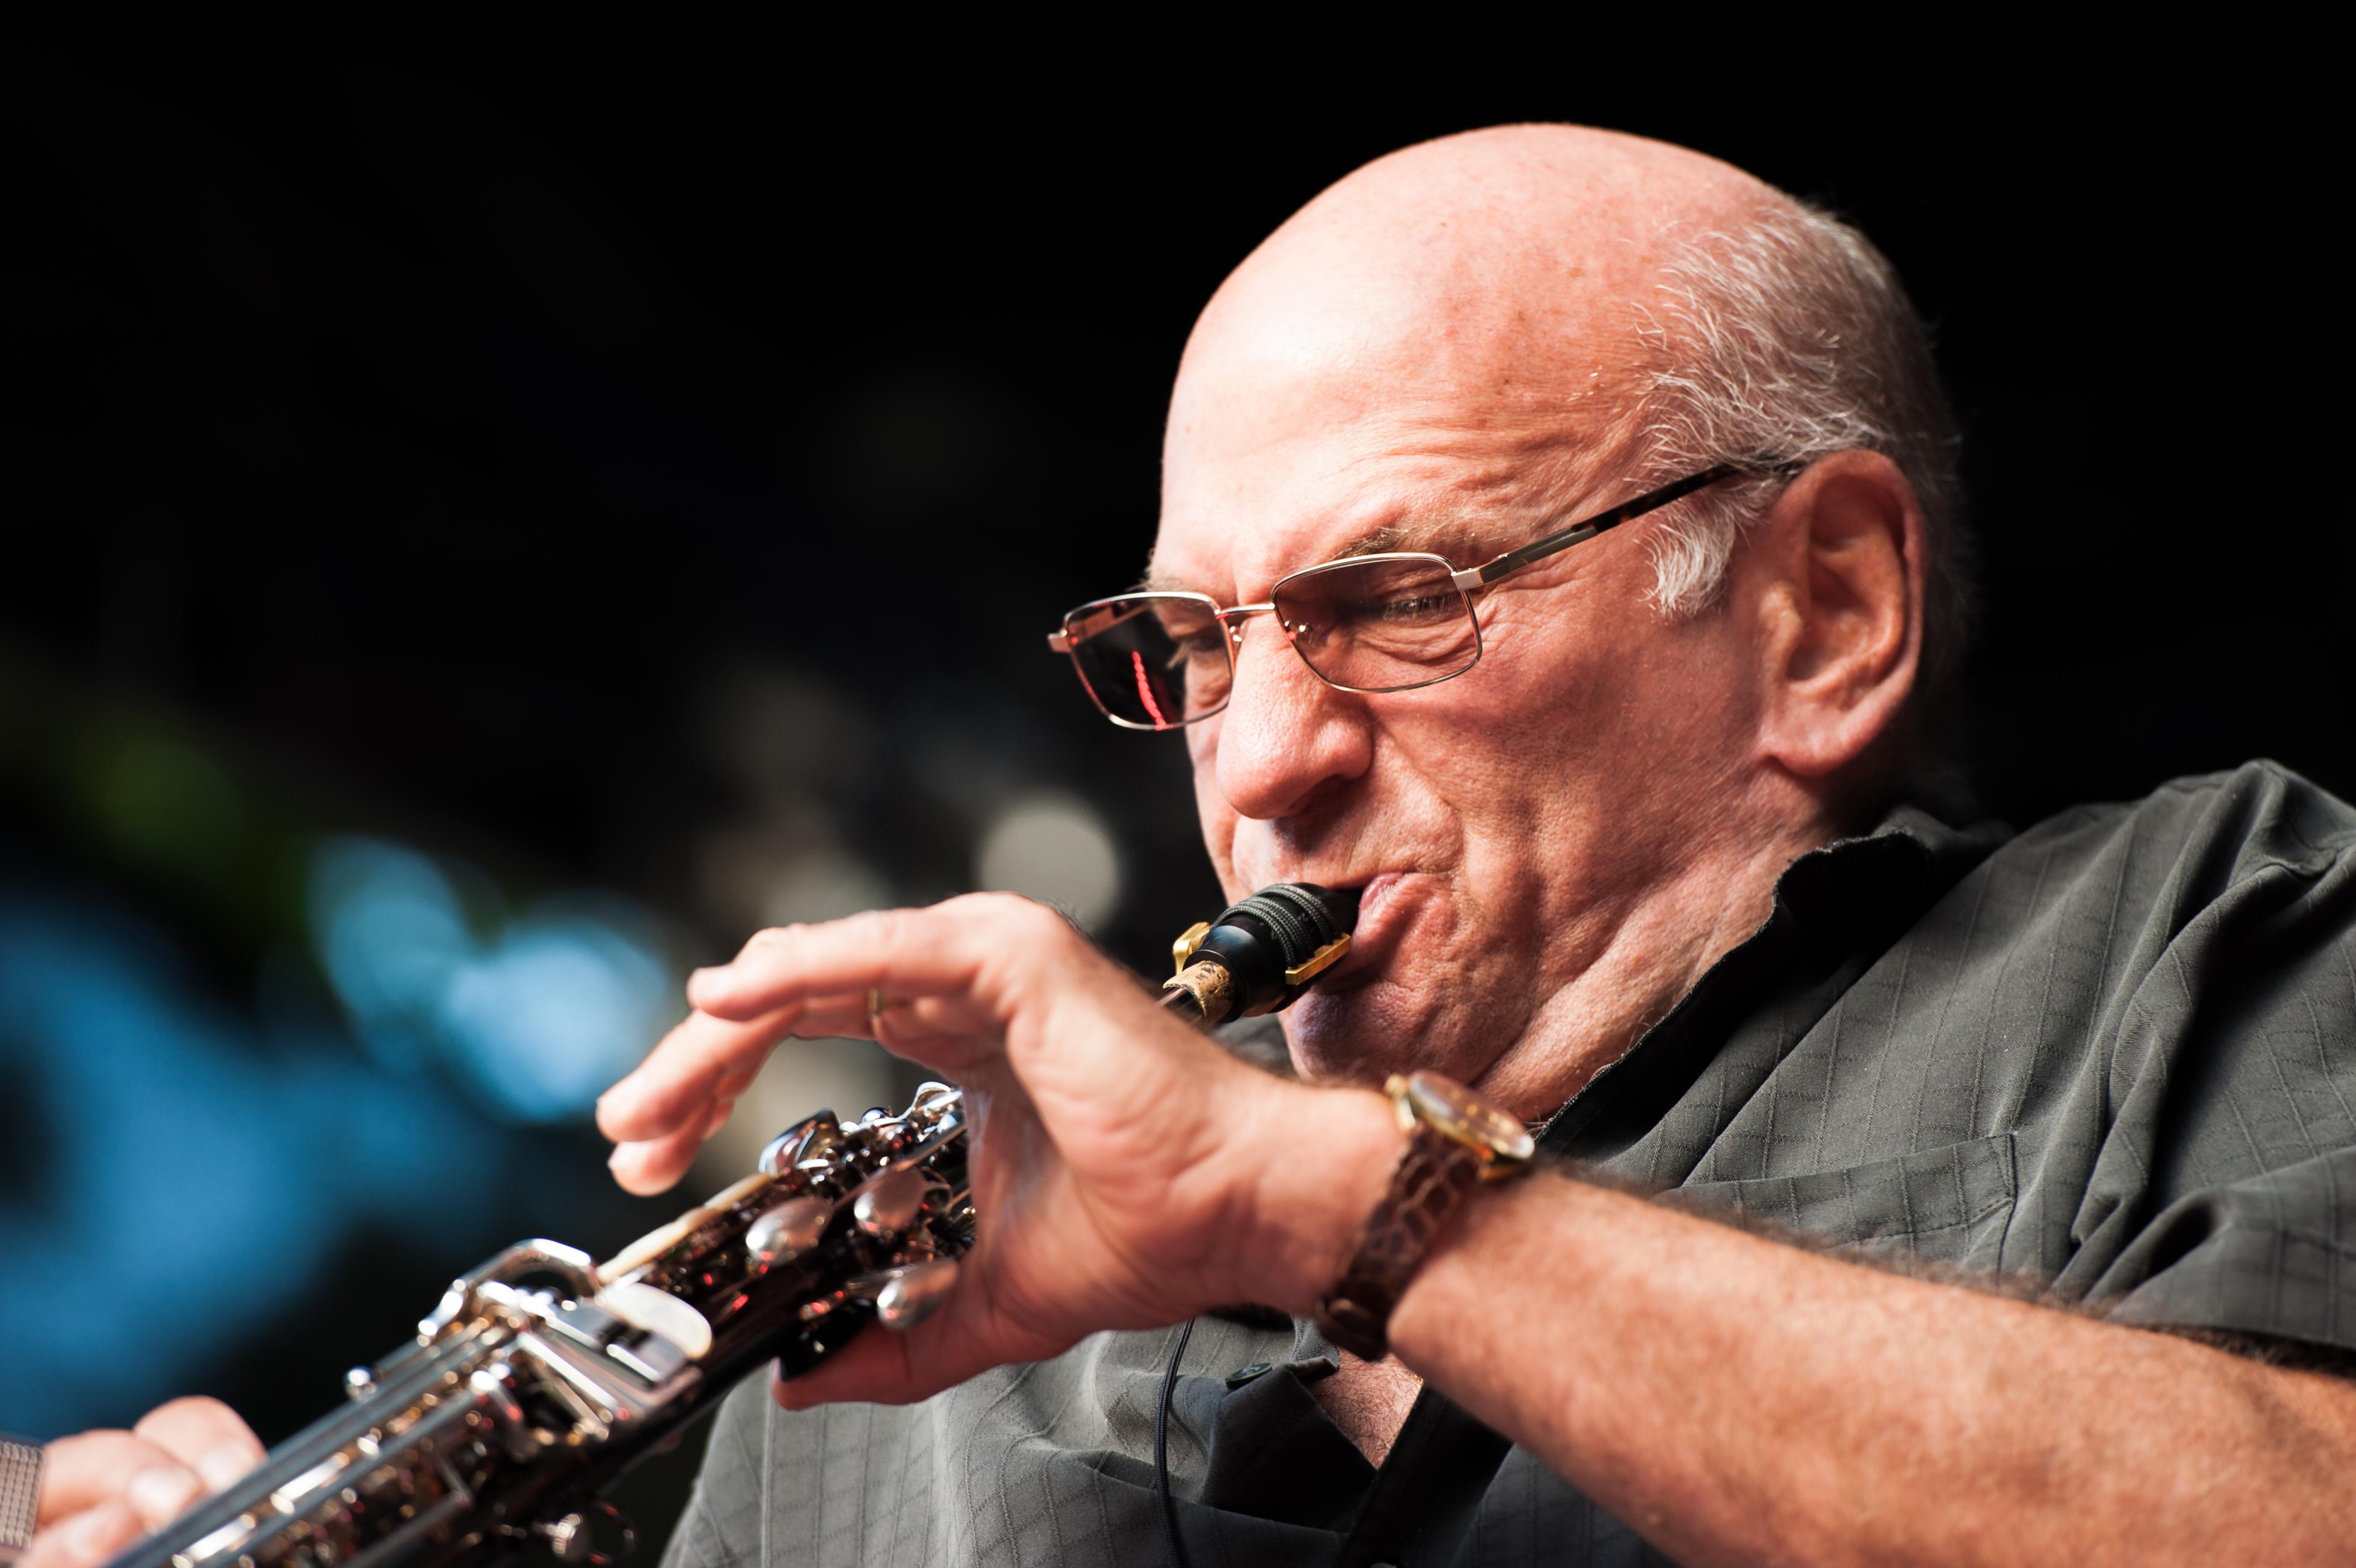 Valencia celebra el XX Festival de Jazz con Hermeto Pascoal o Dave Liebman como estrellas